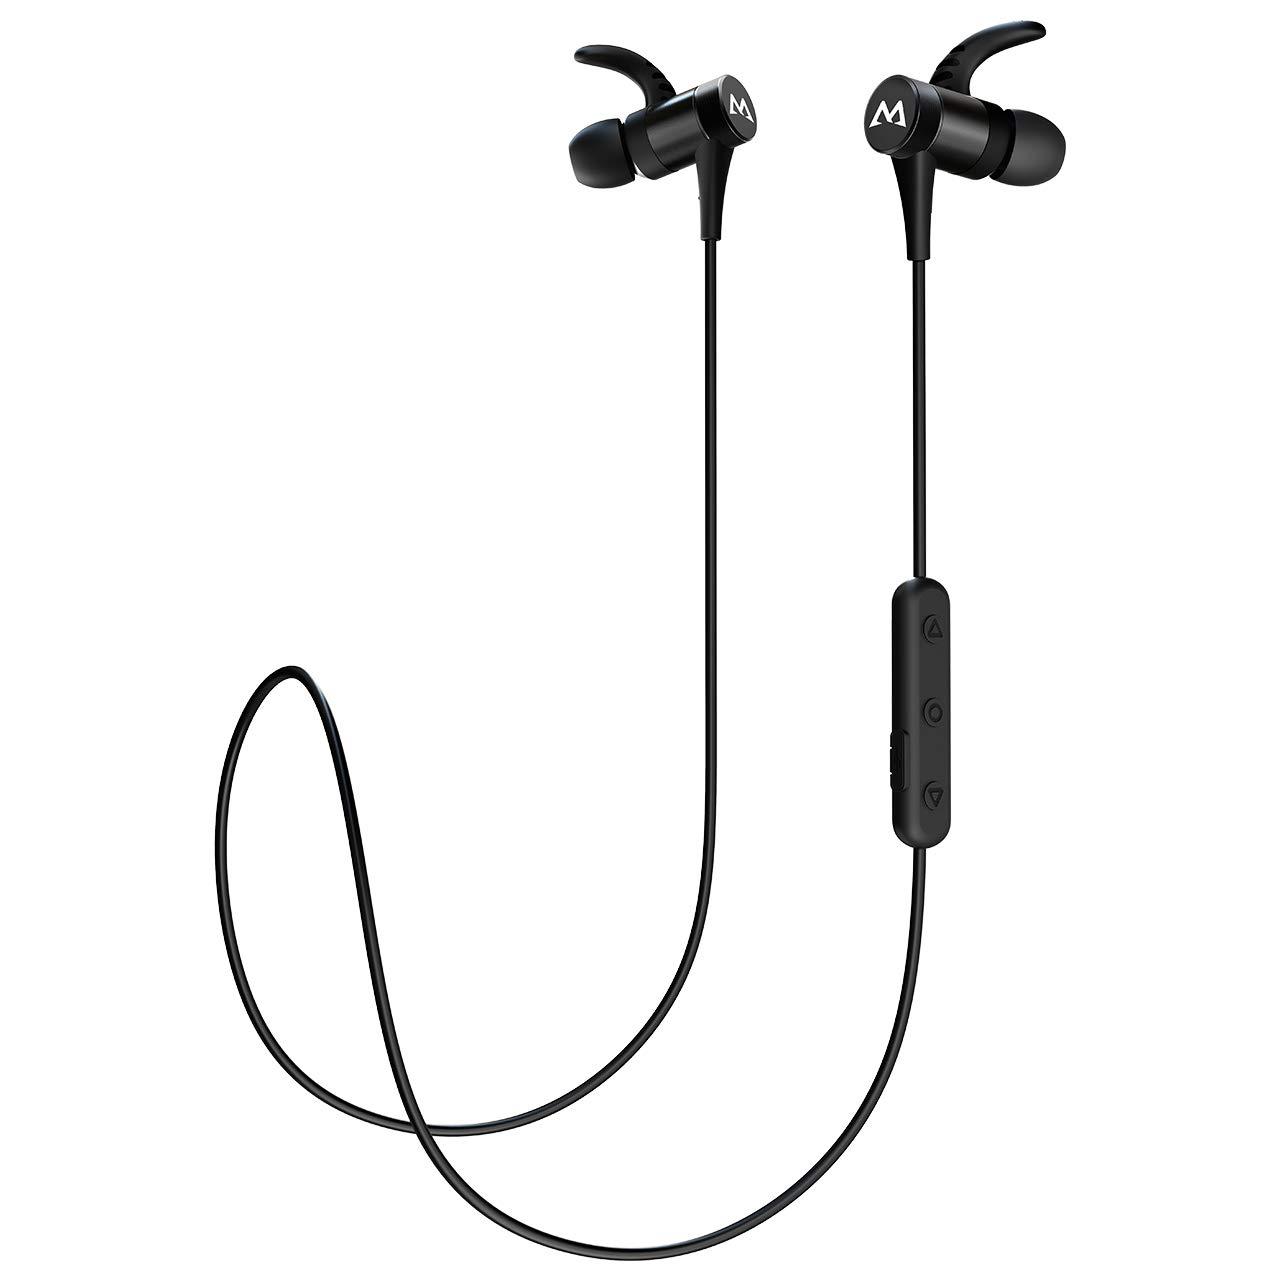 Mpow Bluetooth Headphones Earphones Reduction